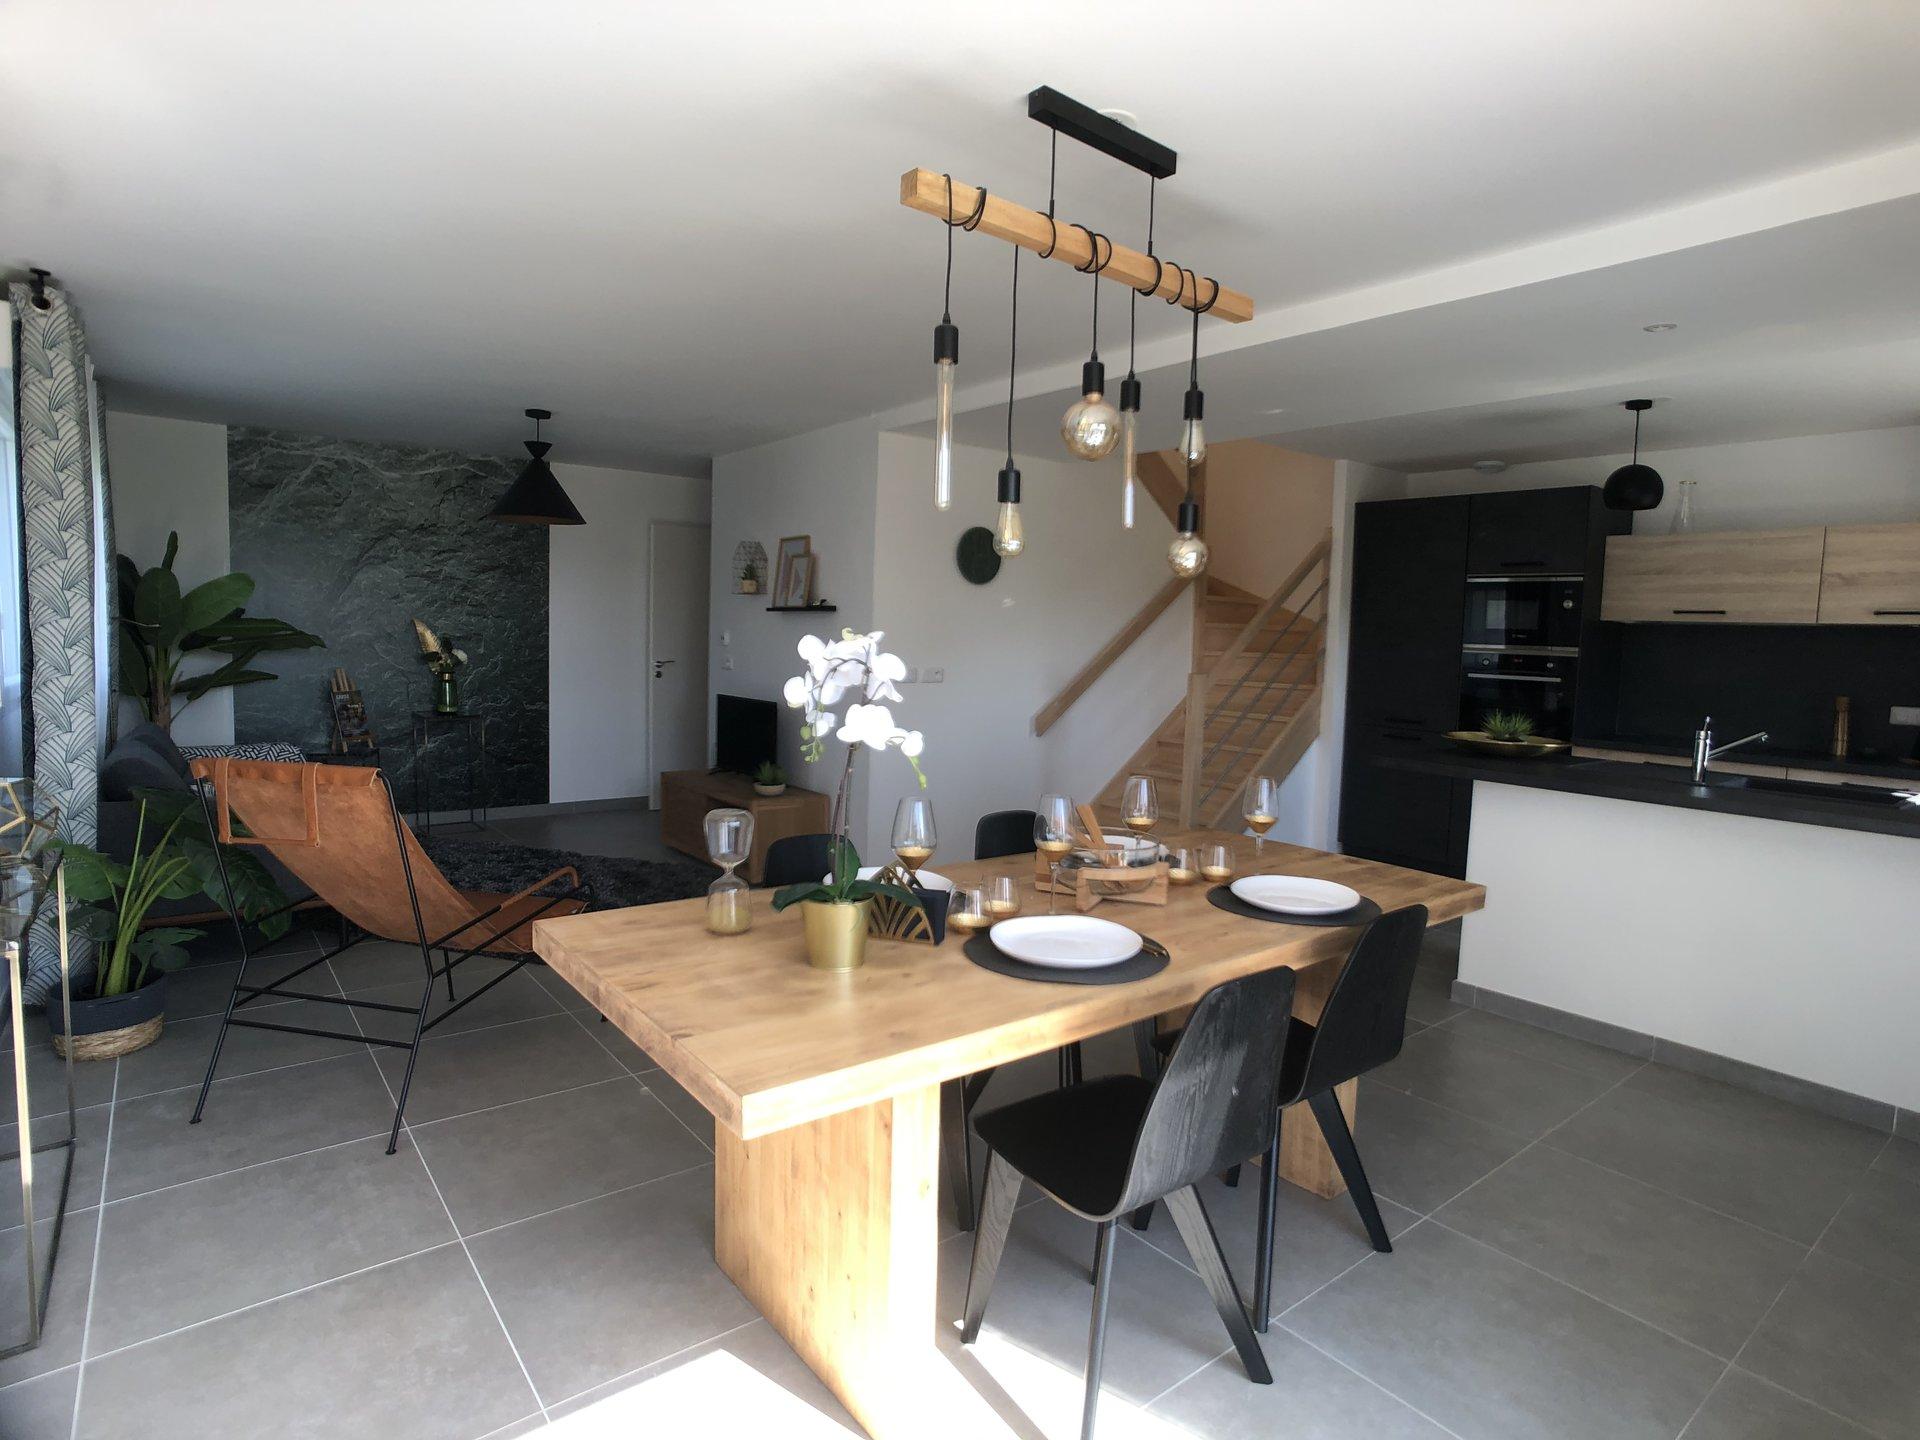 4P - 92 m² - DUPLEX JARDIN - FAVERGES